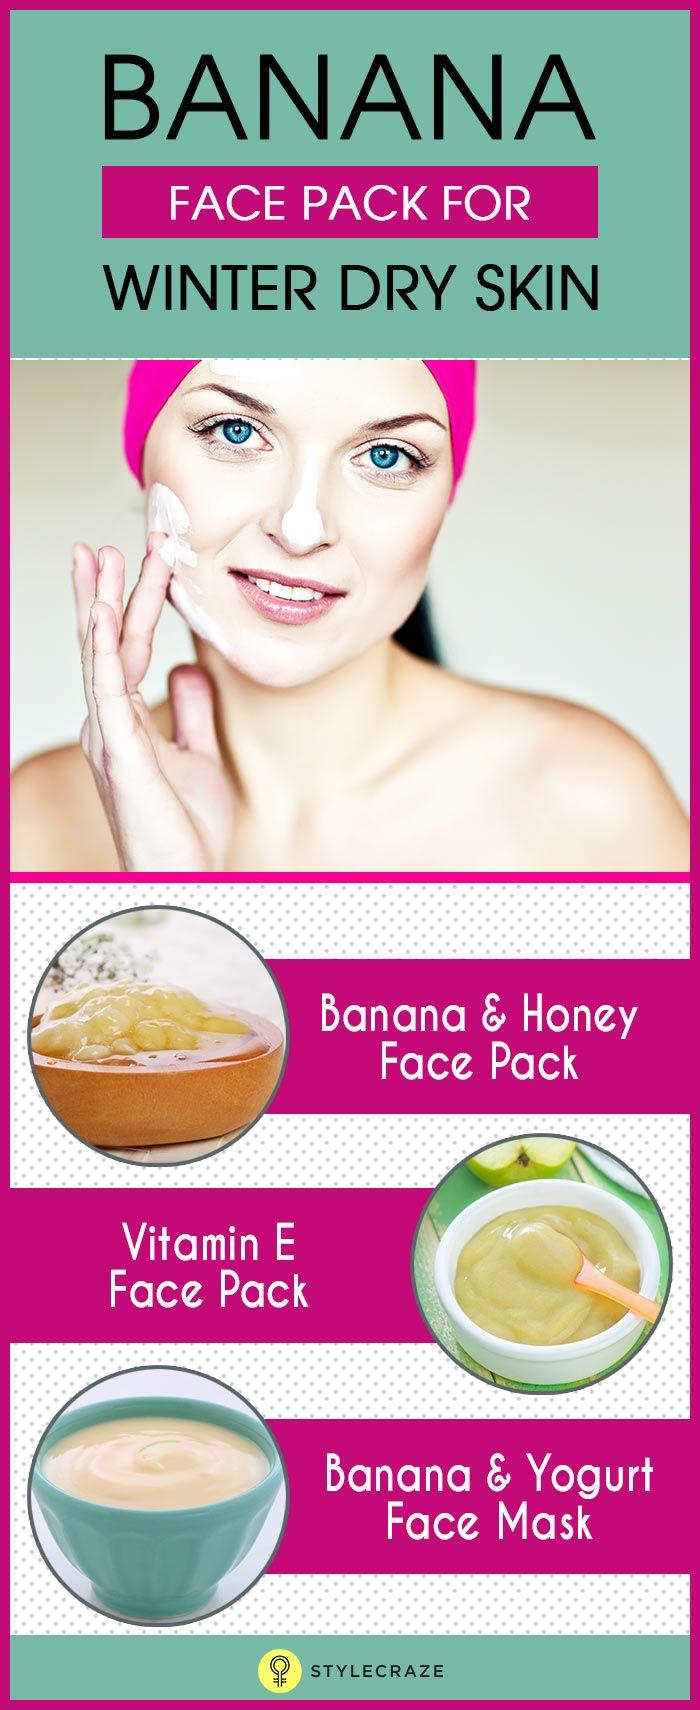 Homemade Banana Face Packs And Face Masks For Dry Skin In